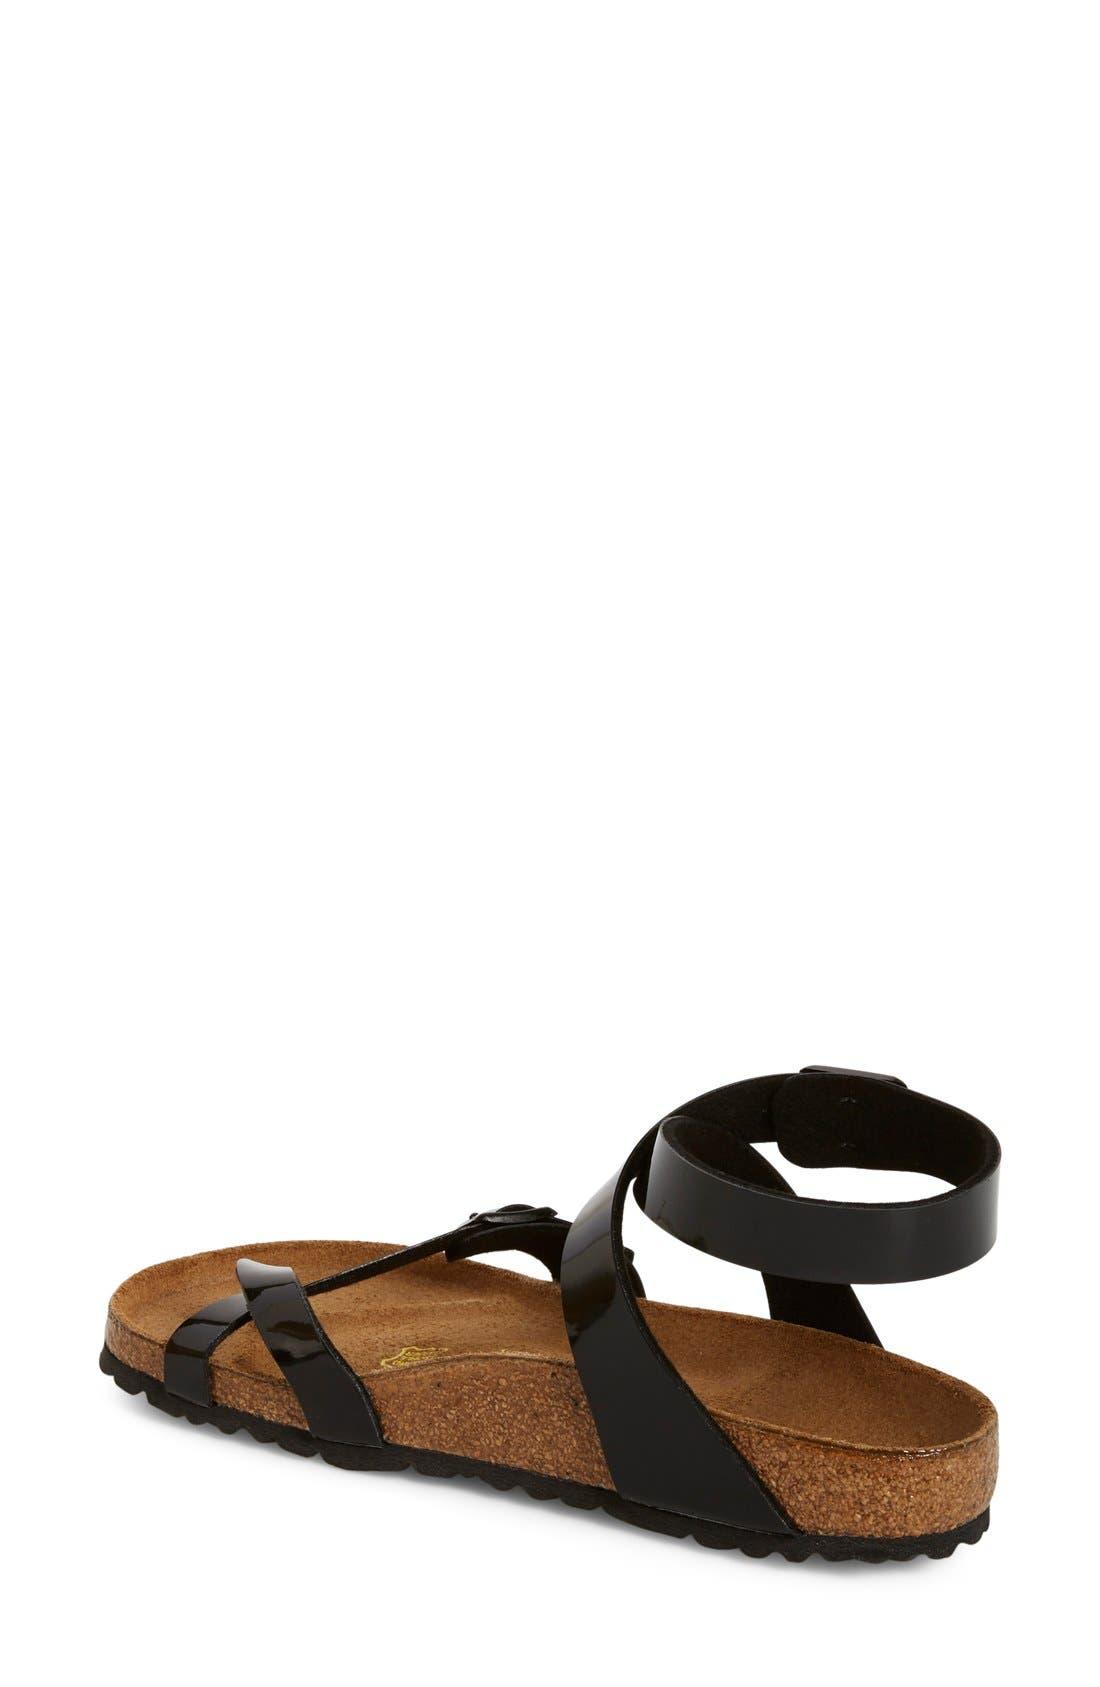 Alternate Image 2  - Birkenstock 'Yara' Birko-Flor™ Ankle Strap Sandal (Women)